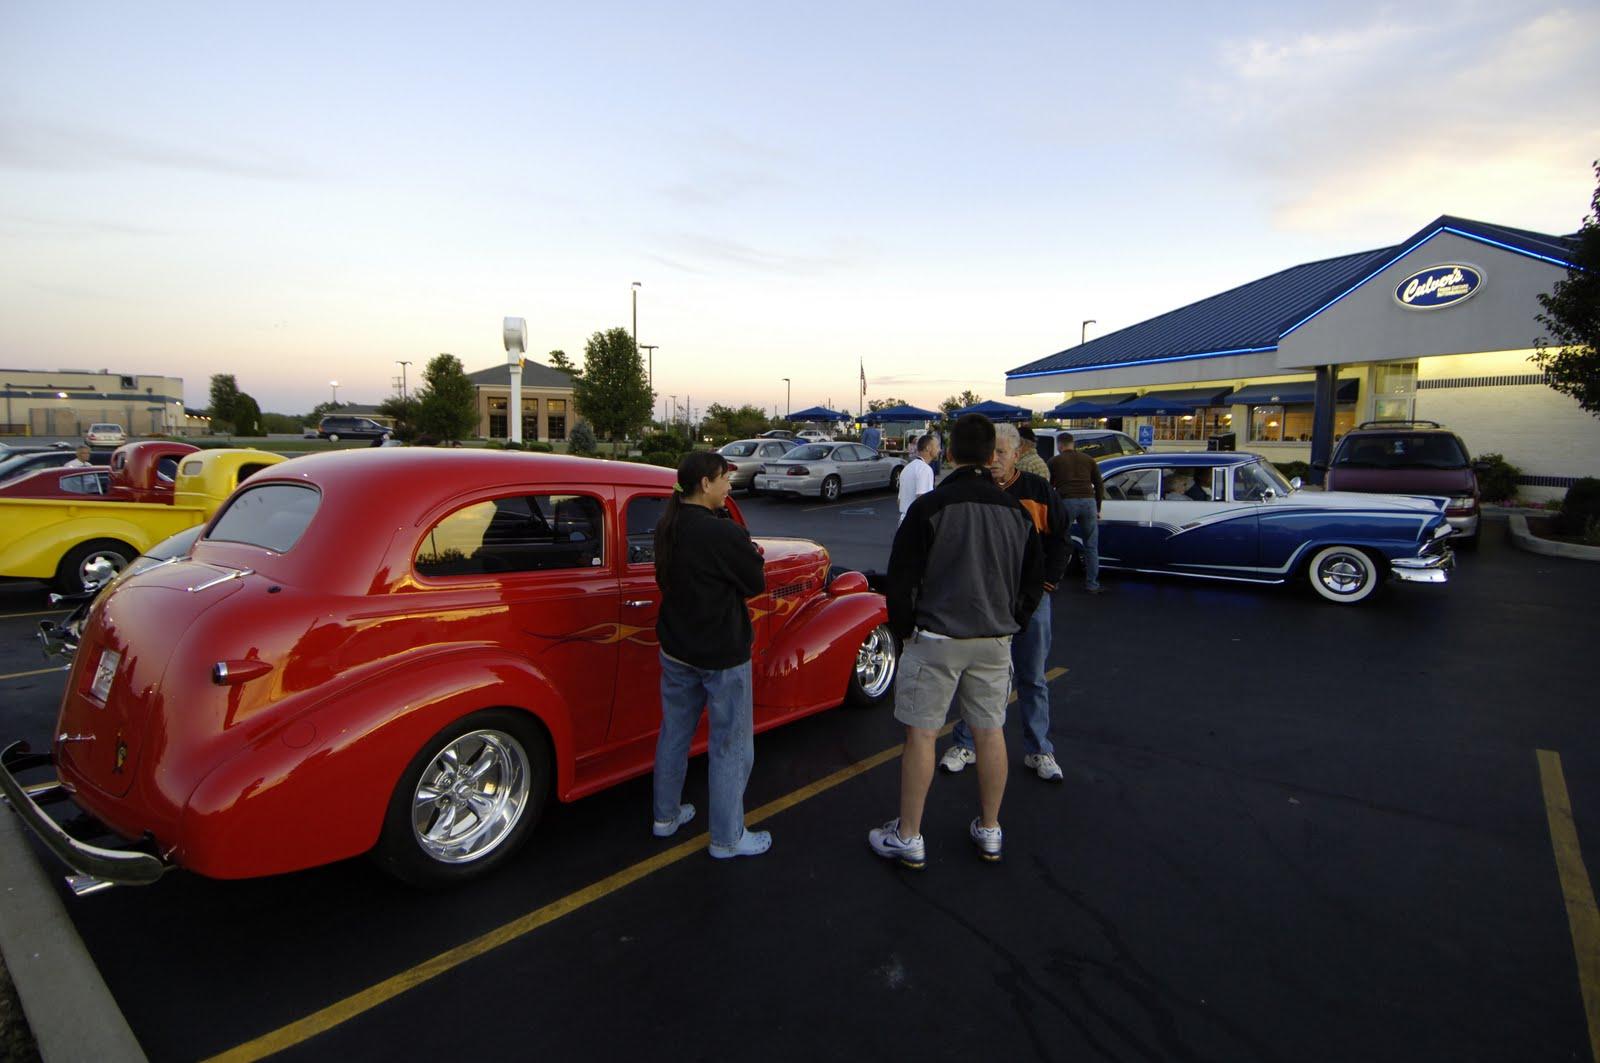 Culvers Car Show Corydon Indiana